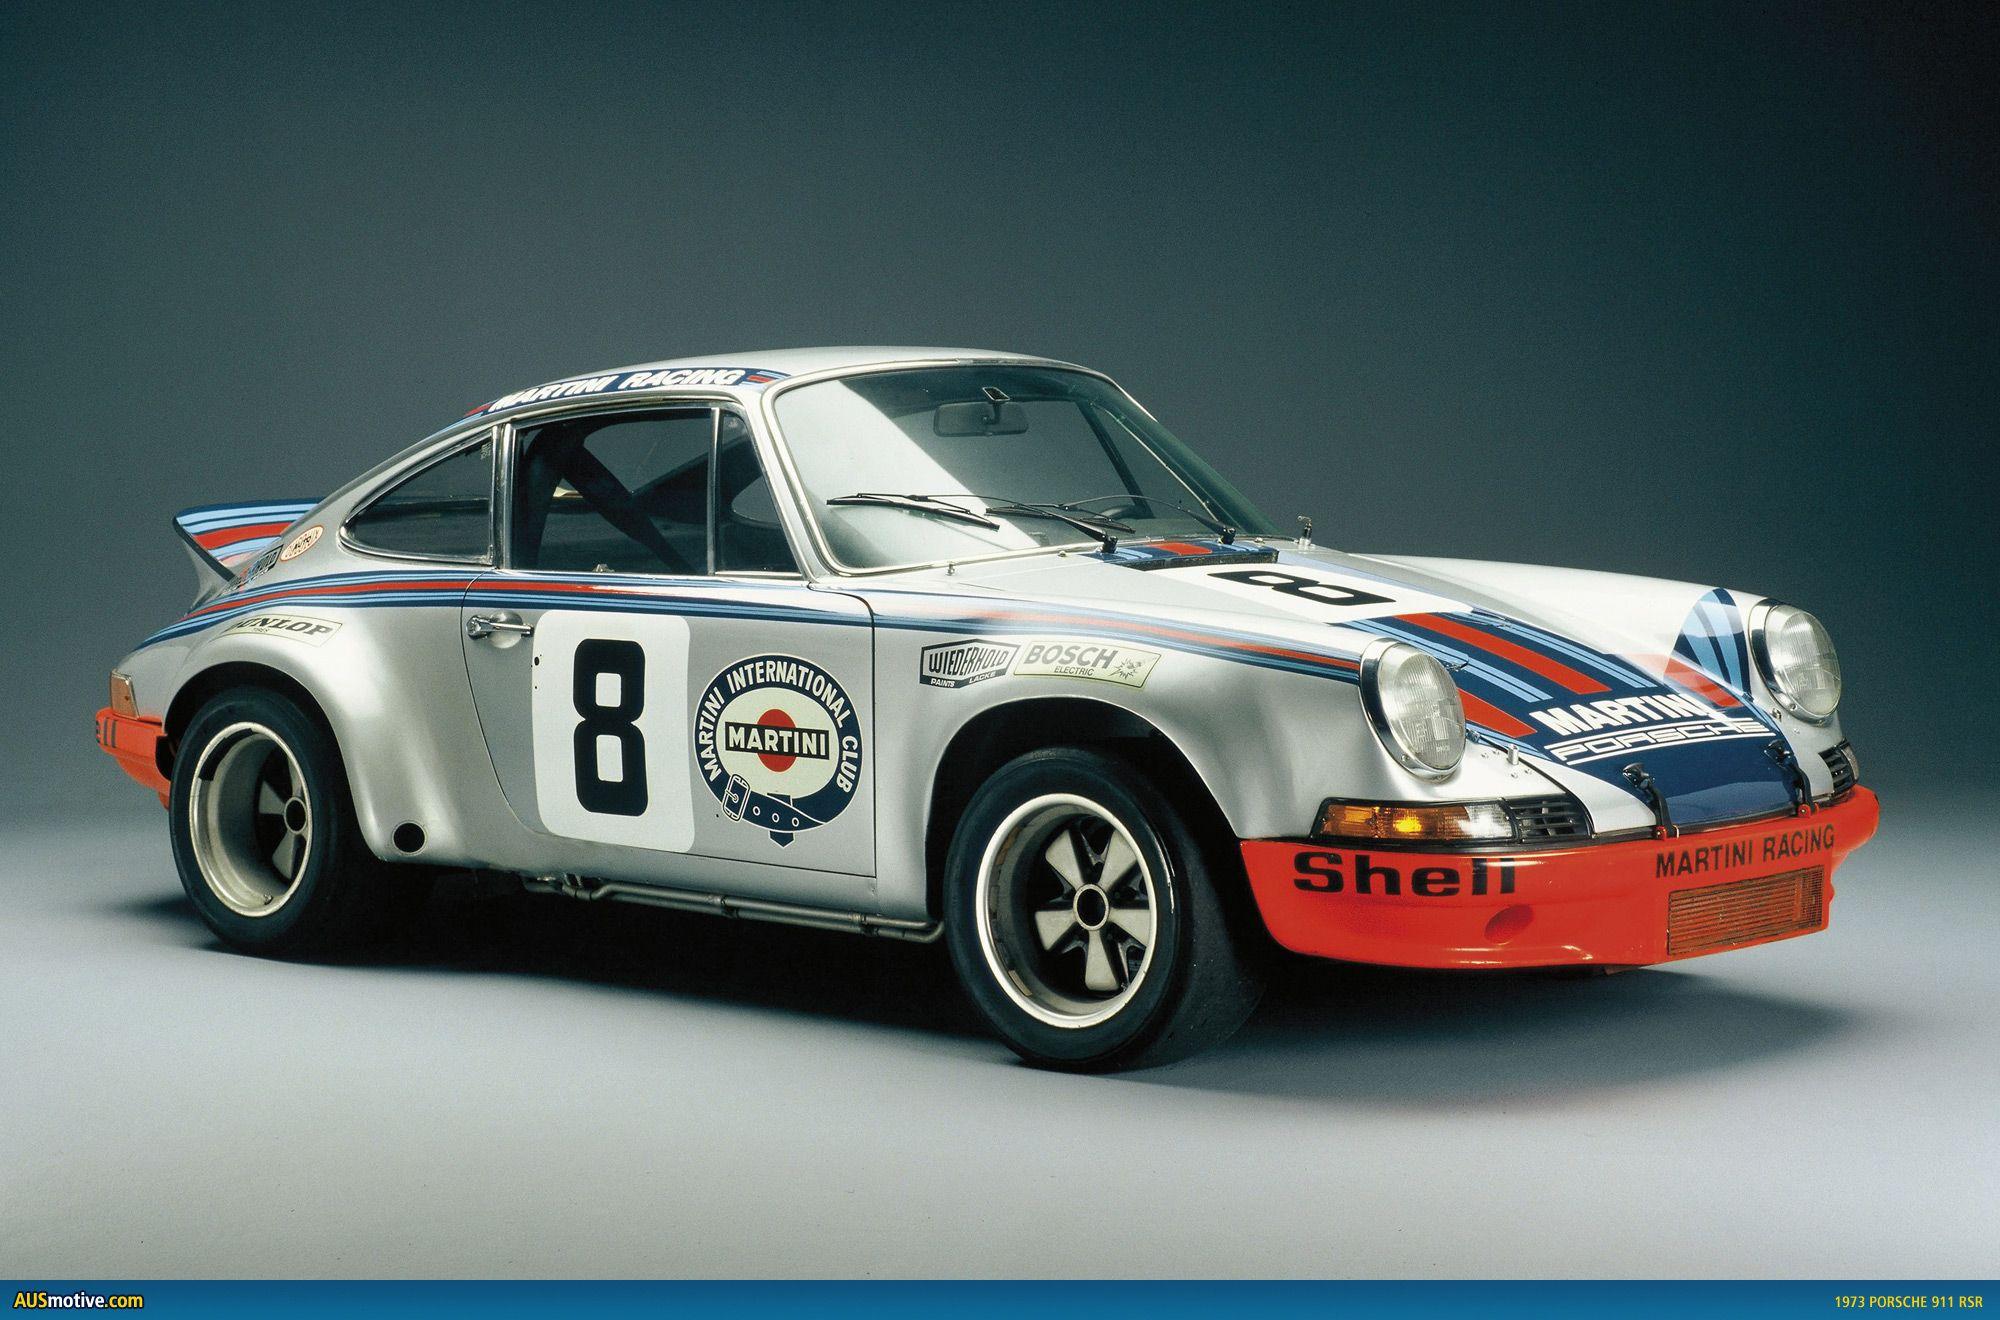 The Best Vintage Porsches on eBay Motors This Week, 5/13/14 ...